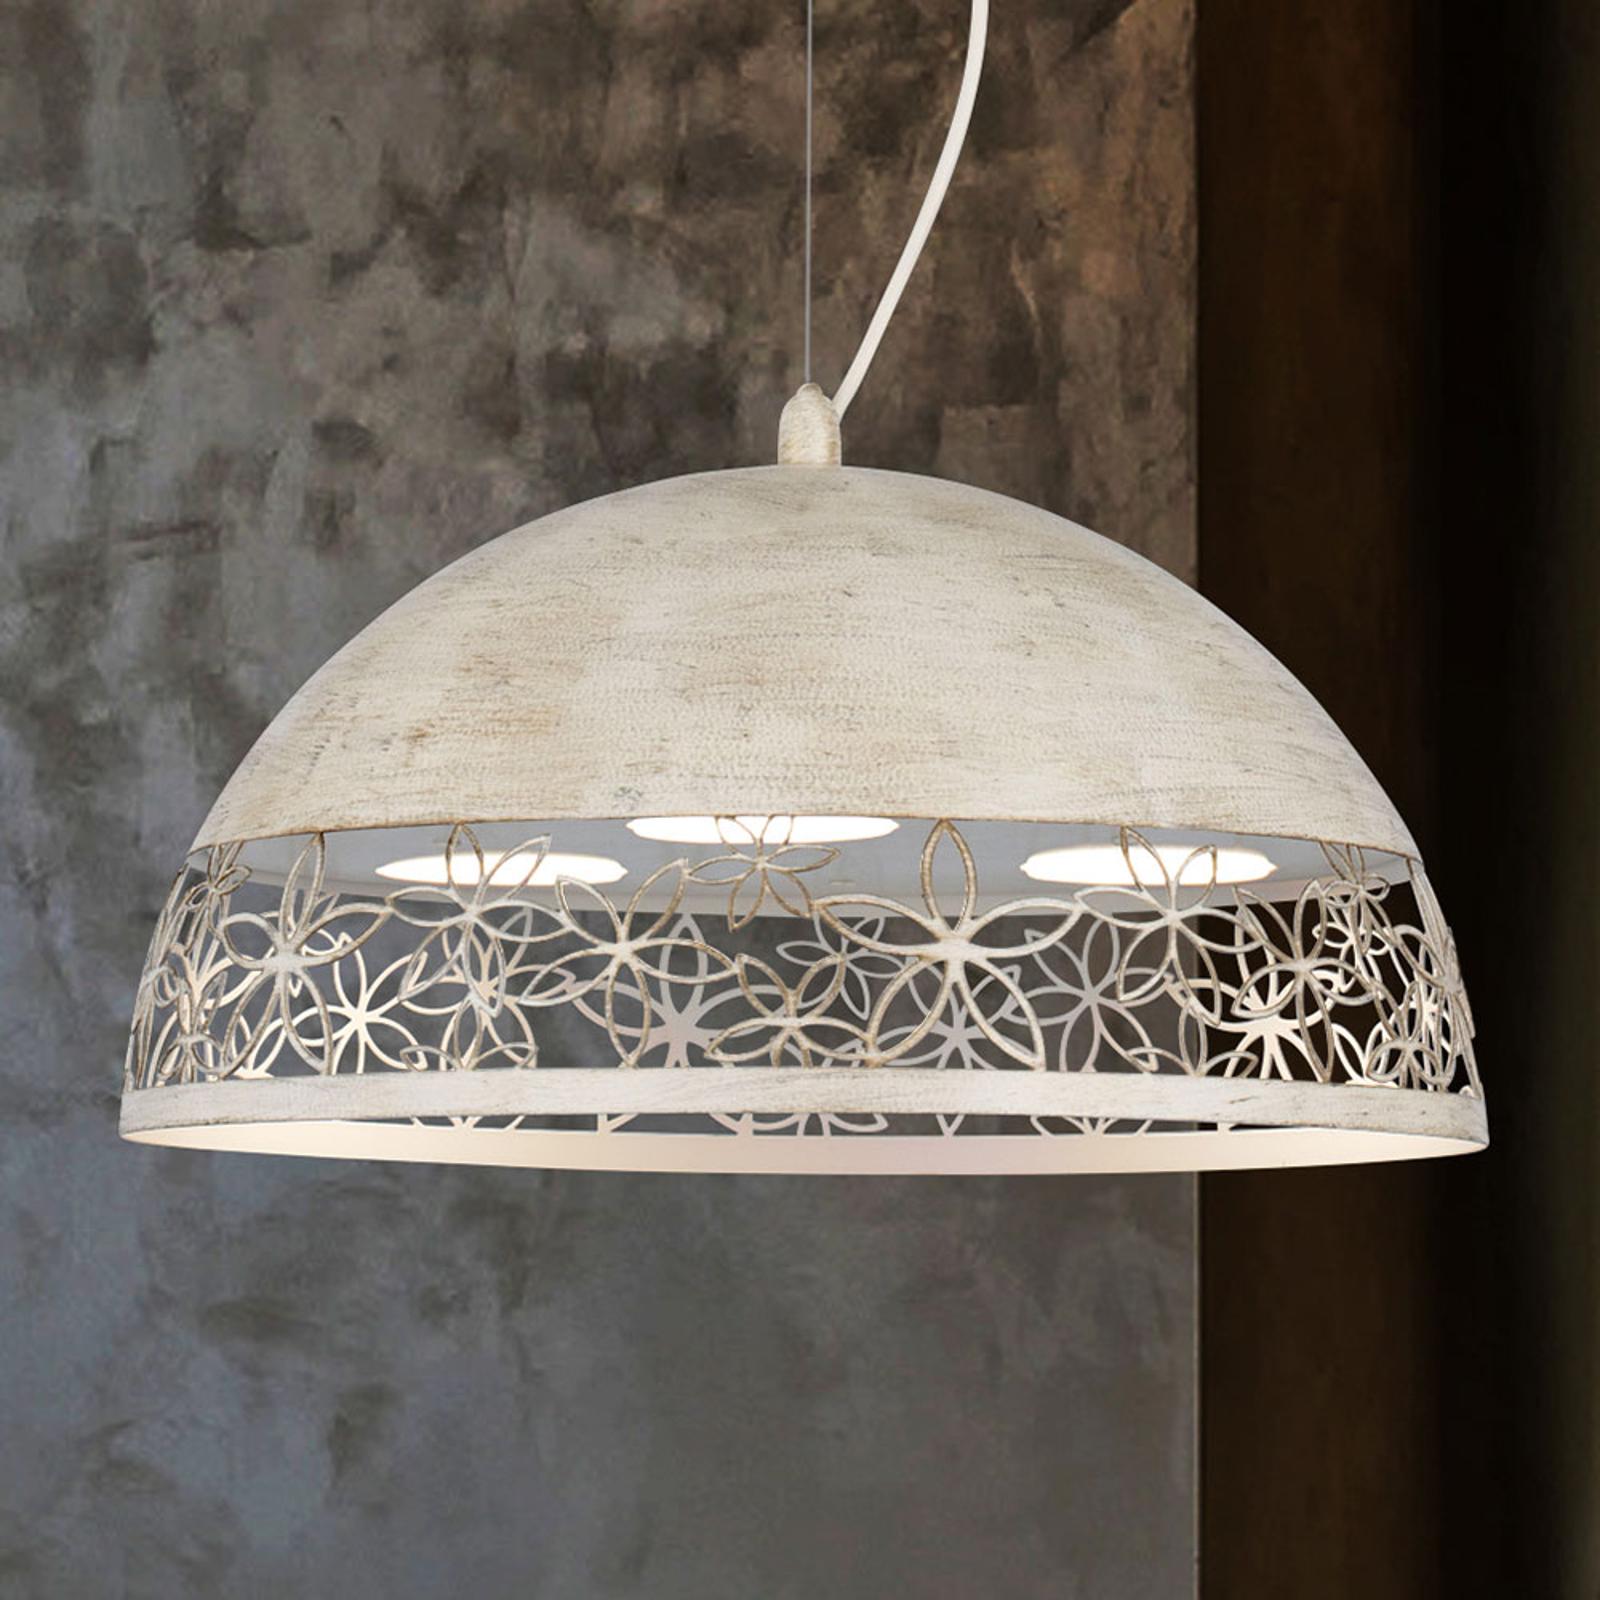 Hanglamp 4522/GX40, tundra wit, Ø 40 cm